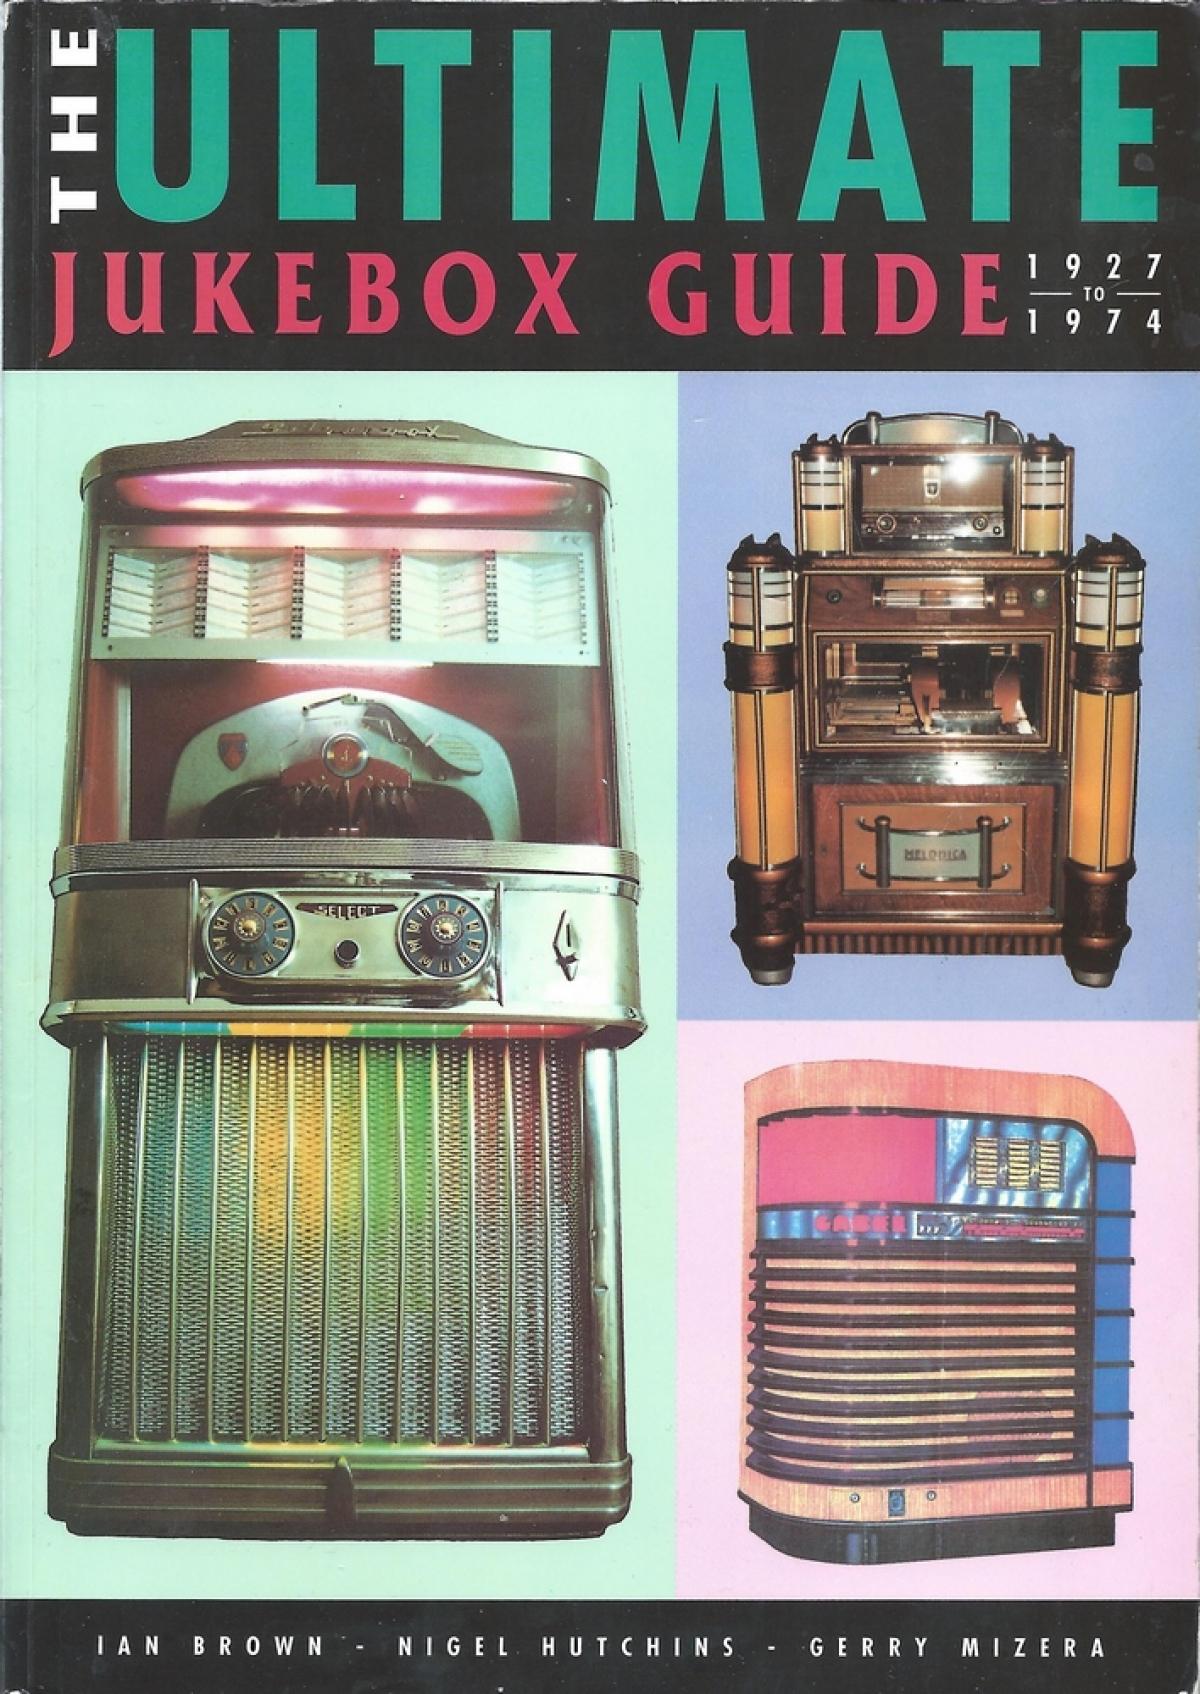 The Ultimate Jukebox Guide